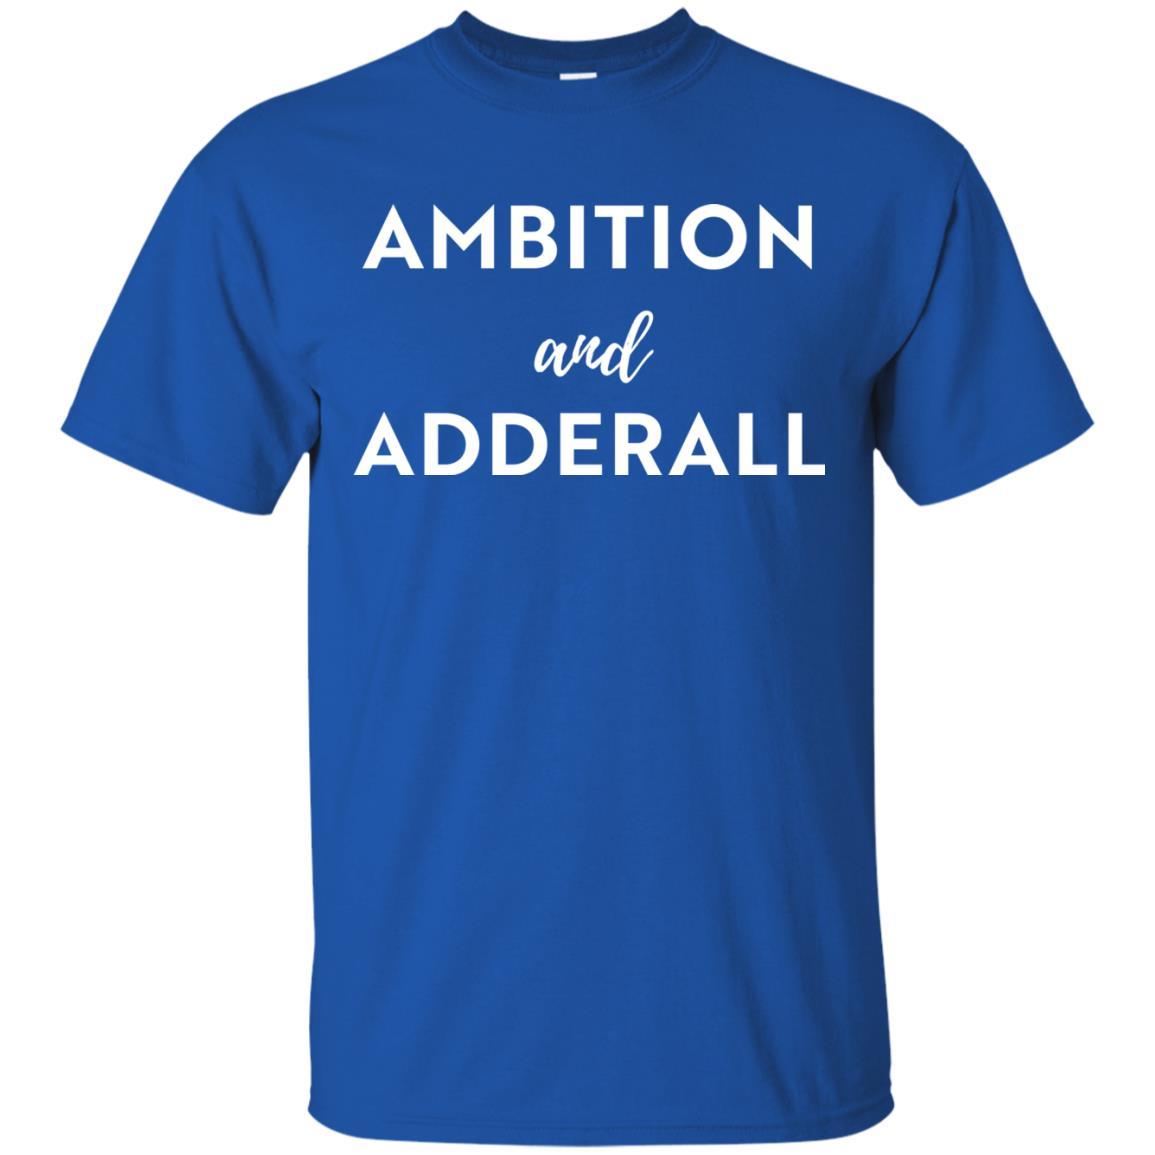 image 1 - Ambition and Adderall T-shirt, Sweatshirt